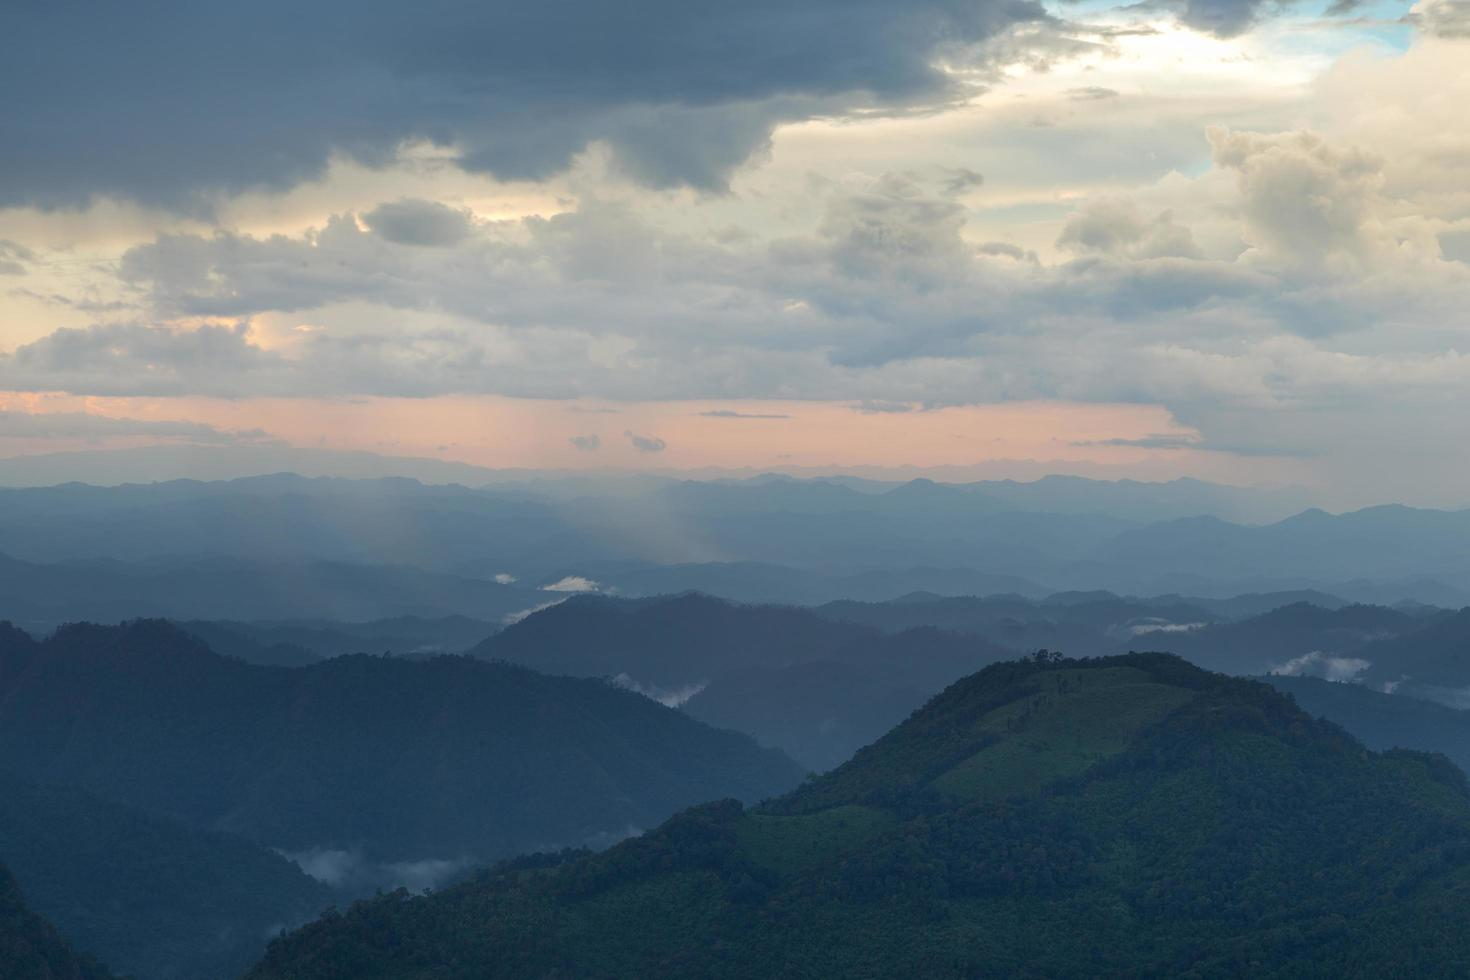 montagne al tramonto foto